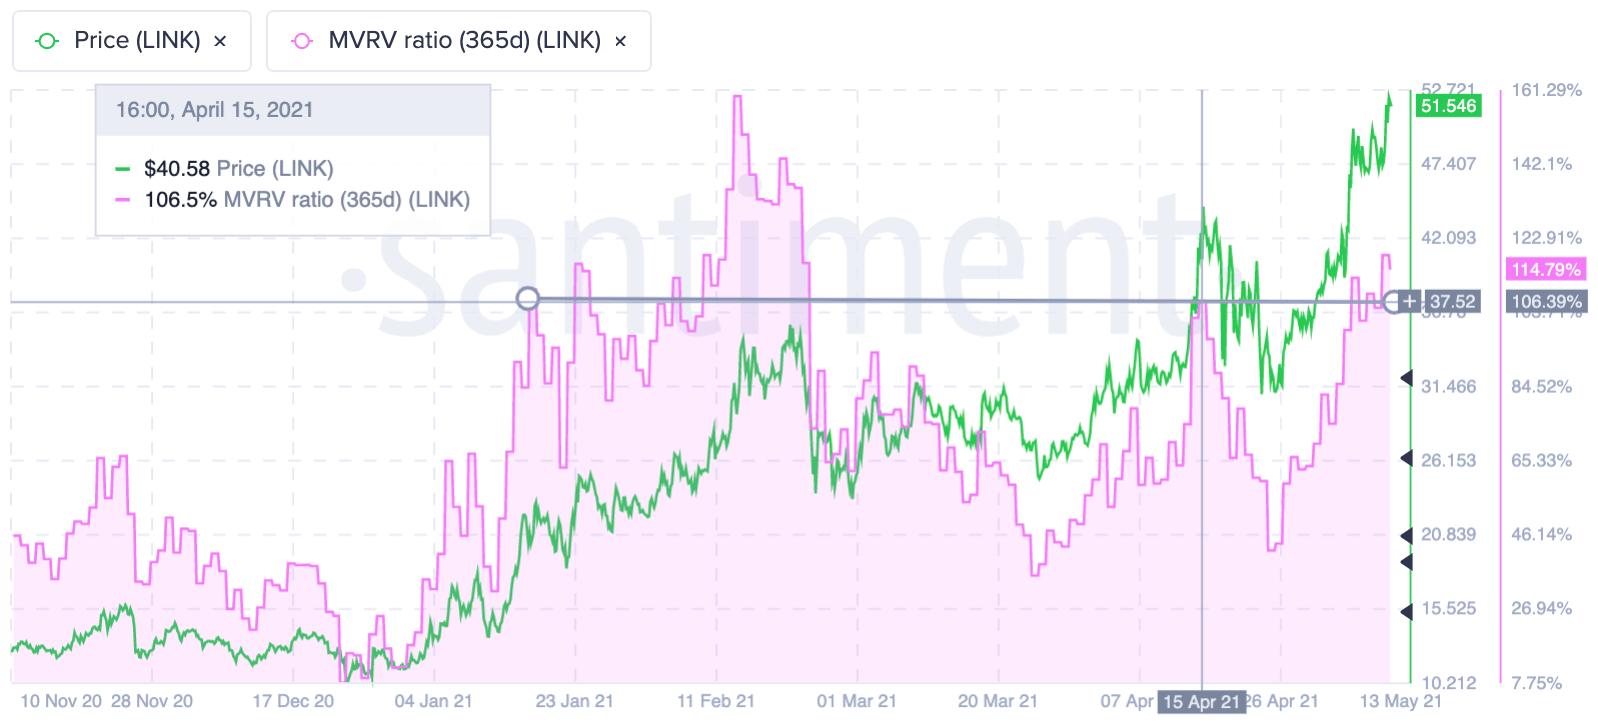 LINK 365 day MVRV ratio